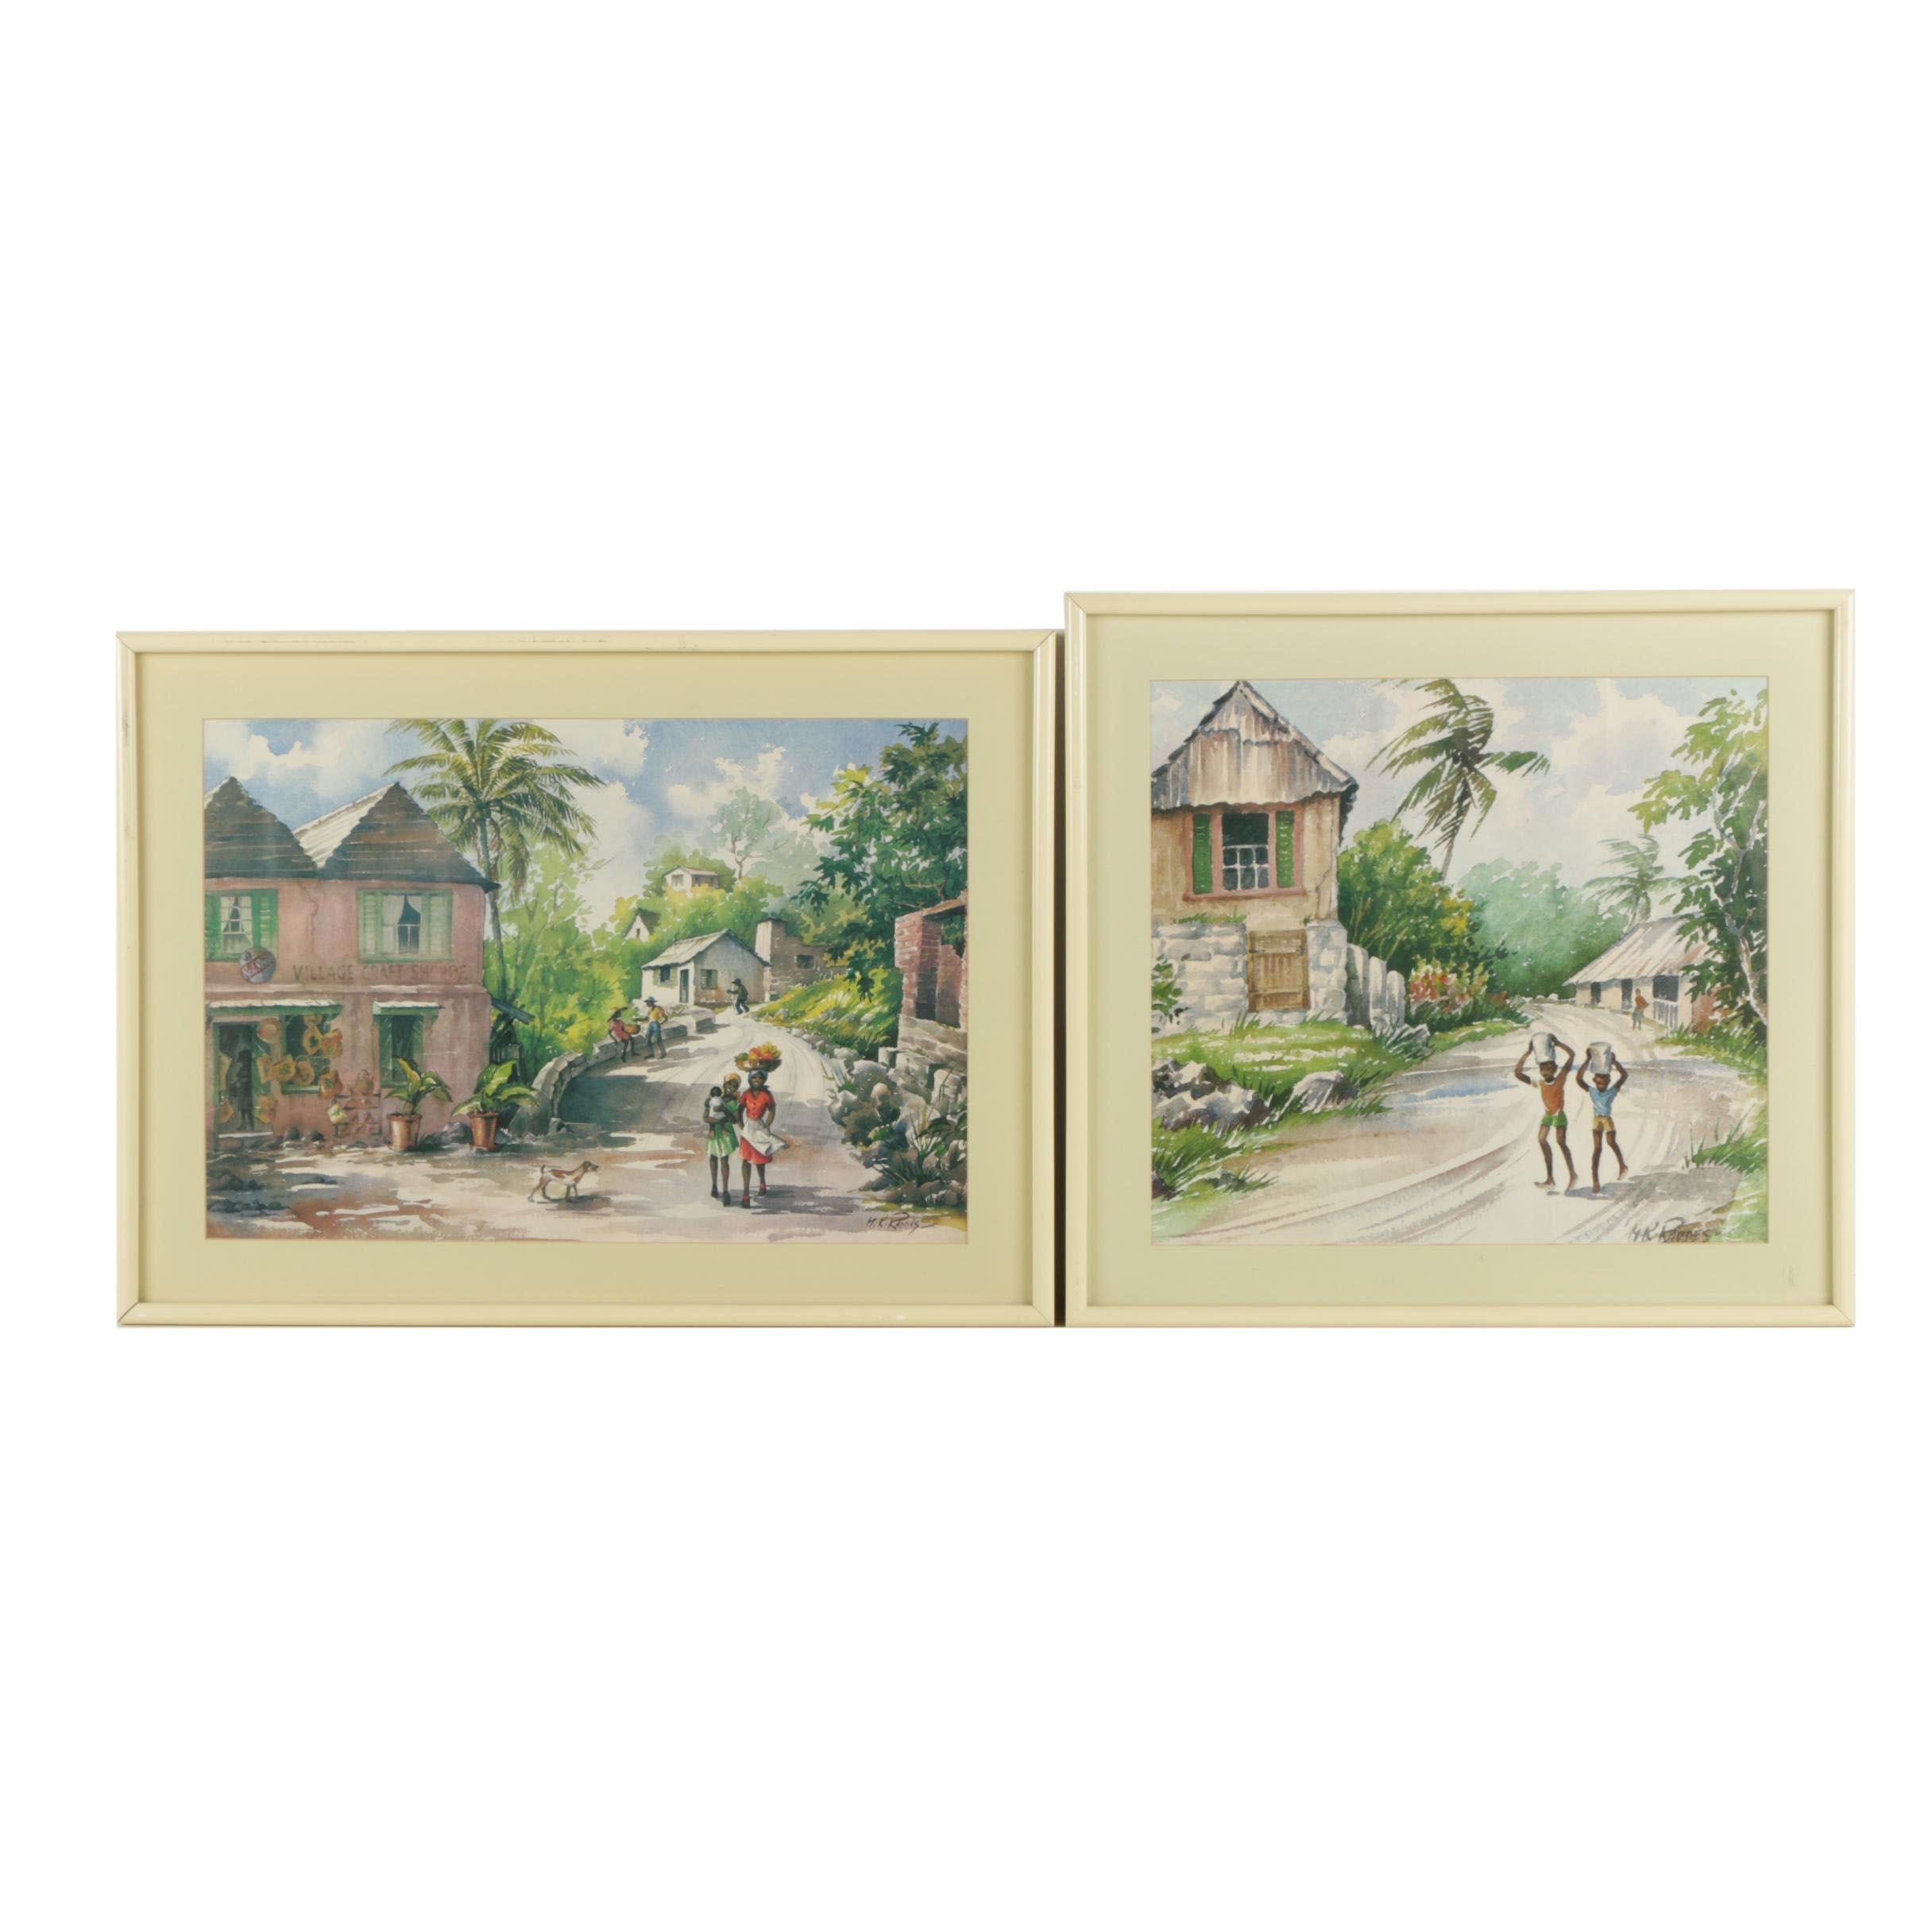 Offset Lithographs on Paper after Margaret K. Rhodes of Jamaican Scenes